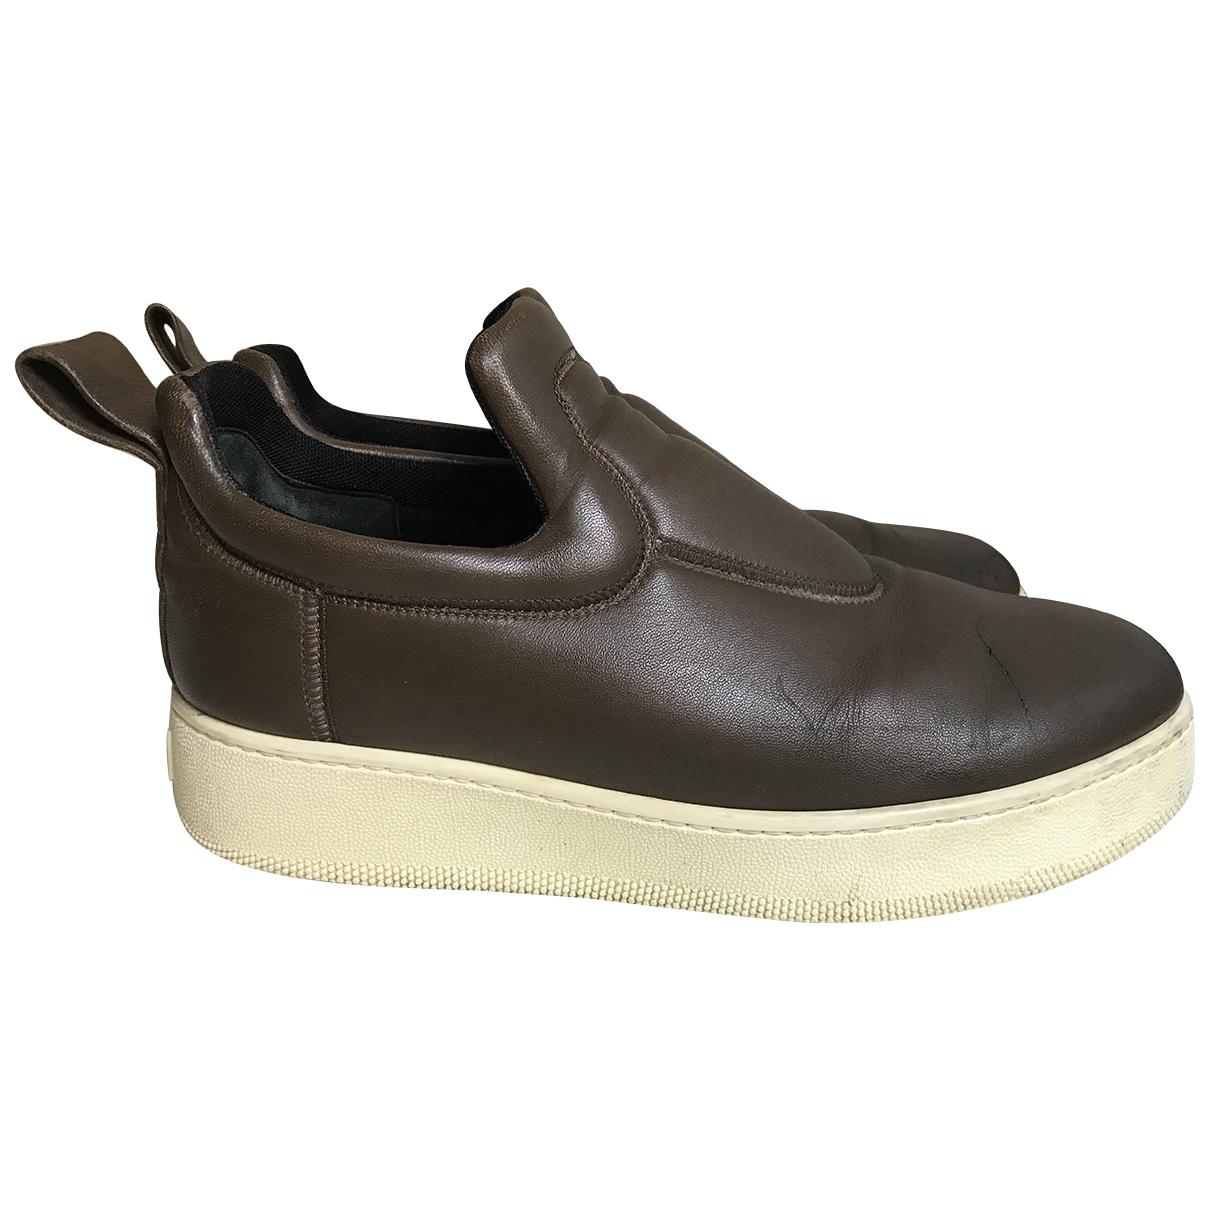 Celine Pull On  Sneakers in  Braun Leder